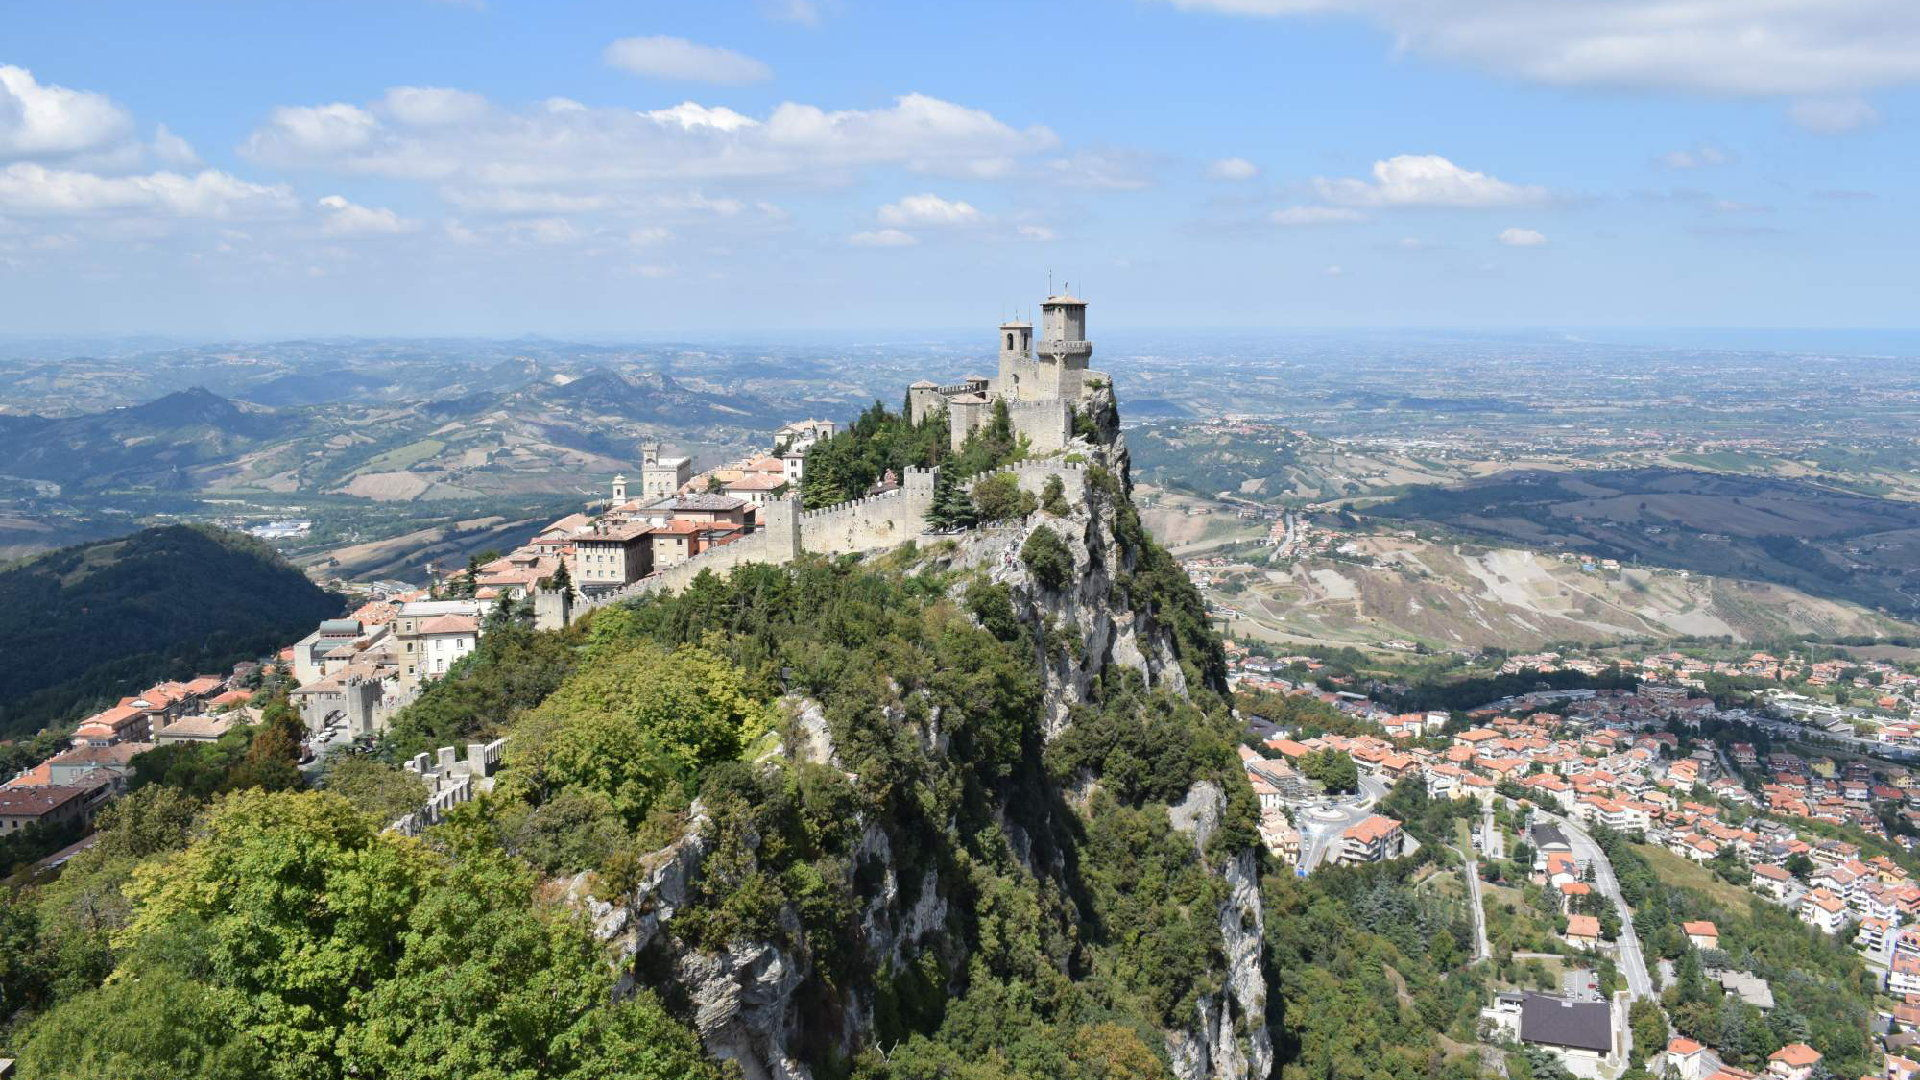 San Marino v Itálii – Turistické zajímavosti, památky